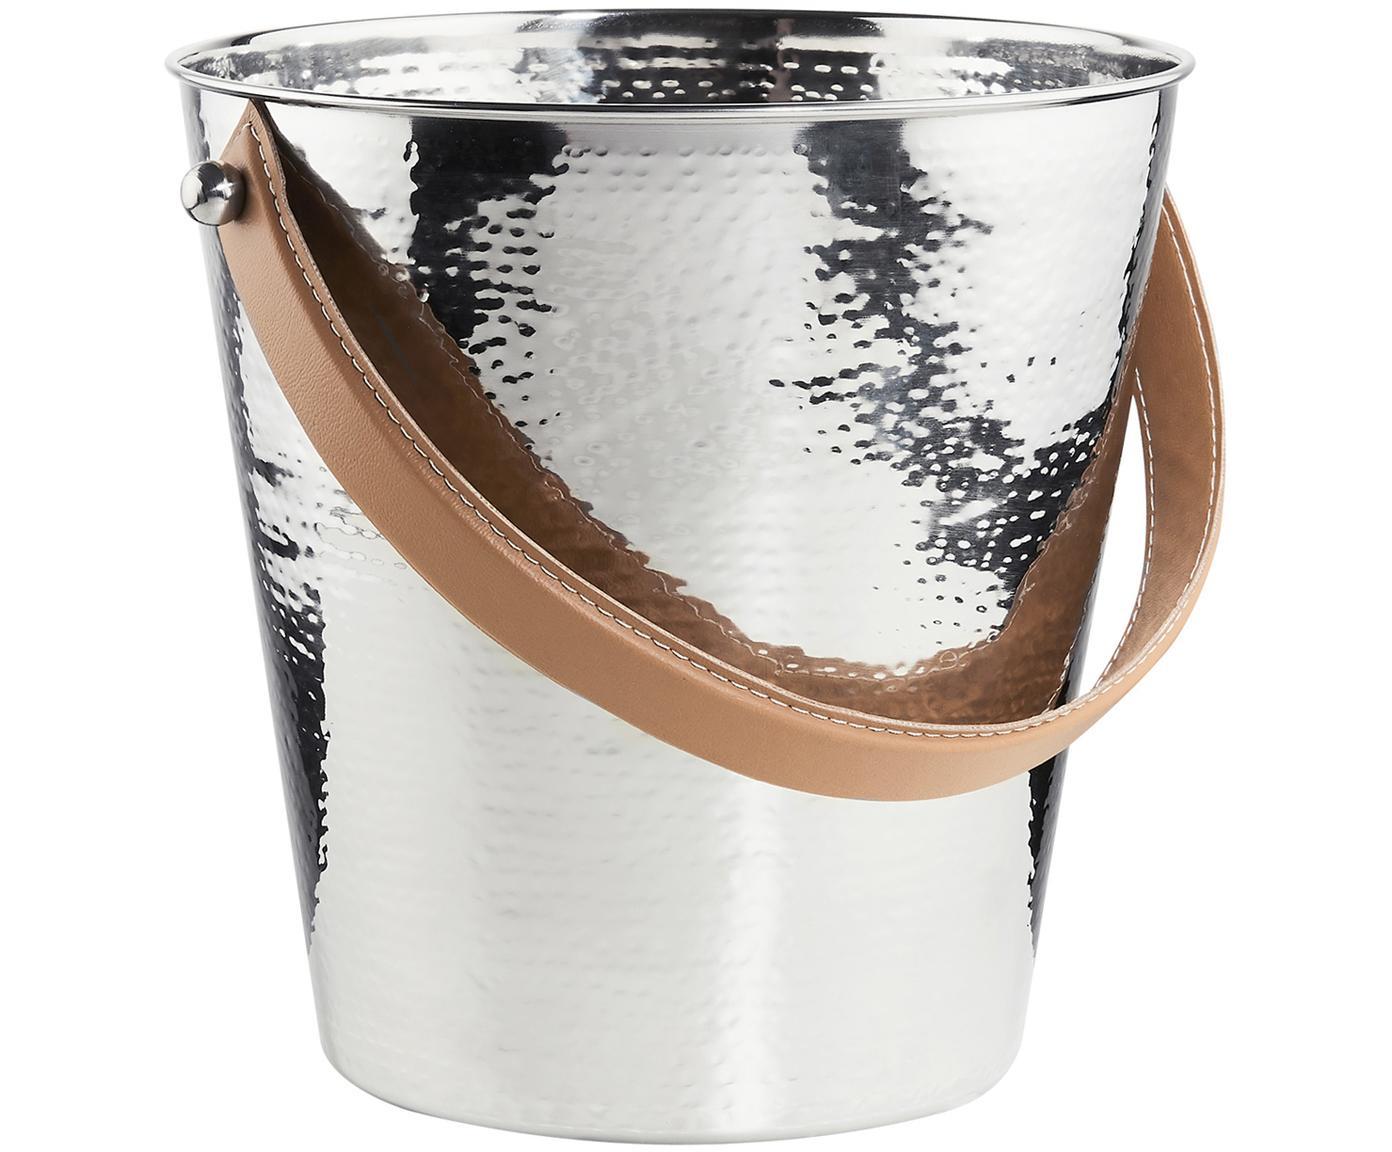 Flessenkoeler Lord in zilverkleurig, Edelstaalkleurig, Ø 24 cm